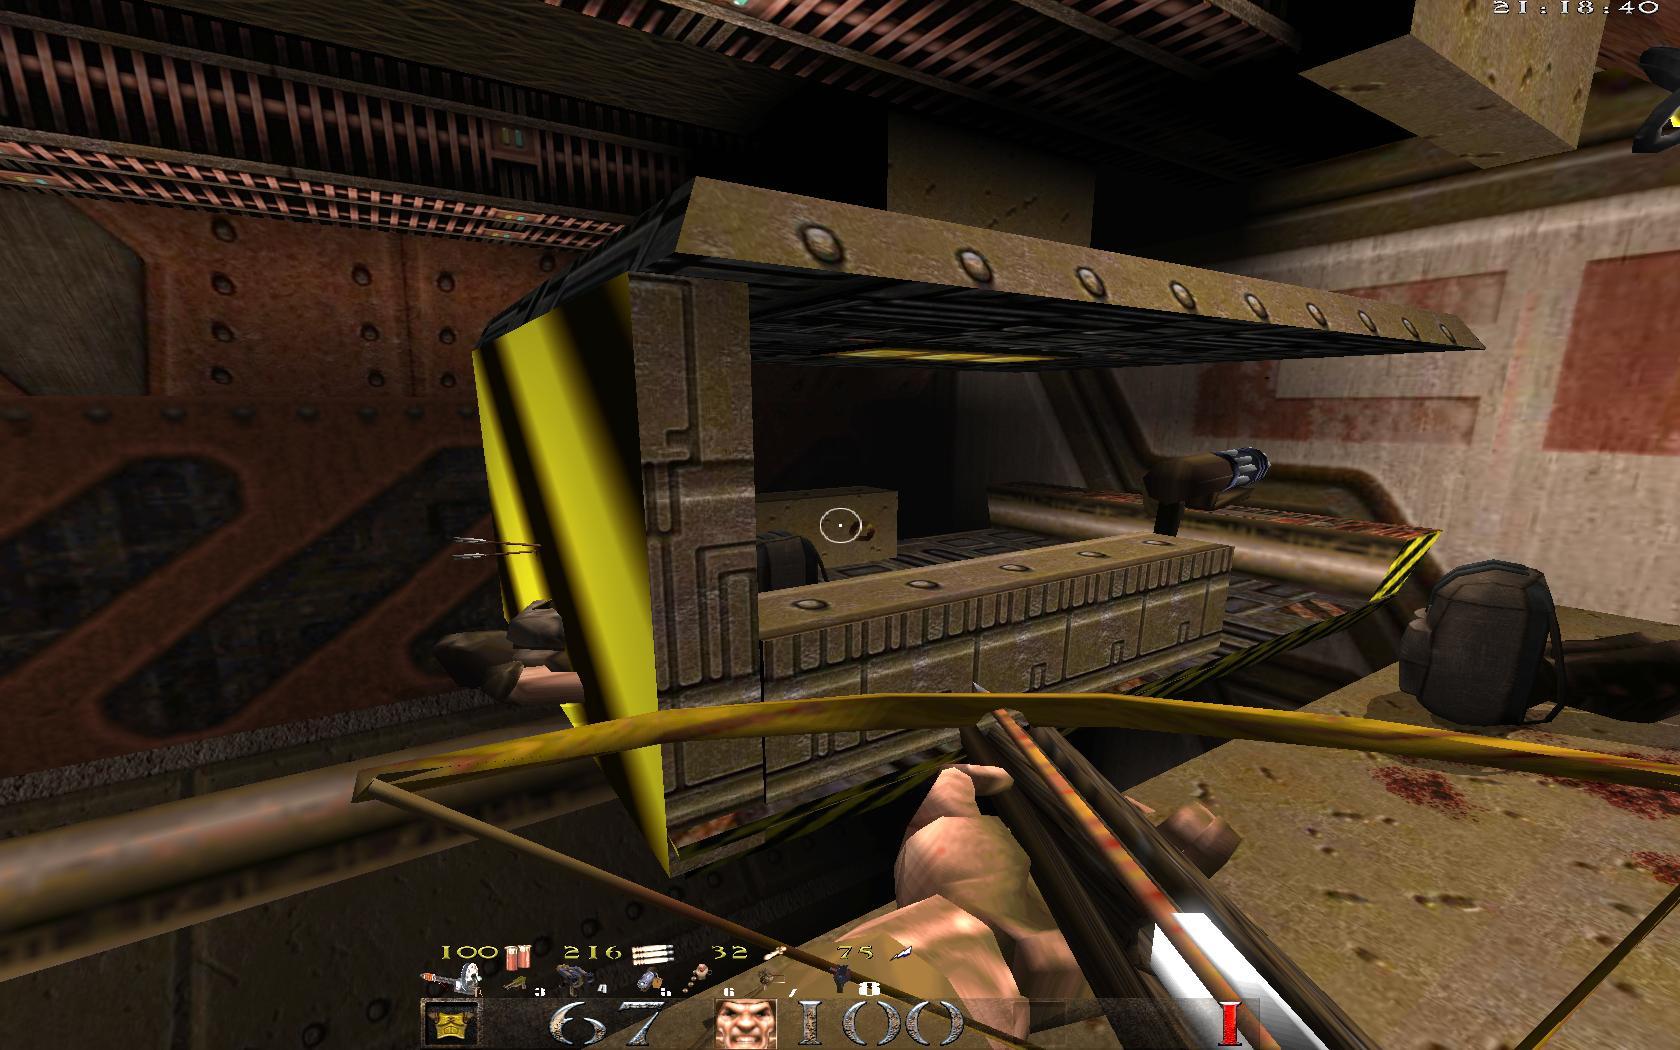 Quake Mountain addon for Quake 1 (qrack port) - стрелы убивают сквозь стену :) - Quake Мод